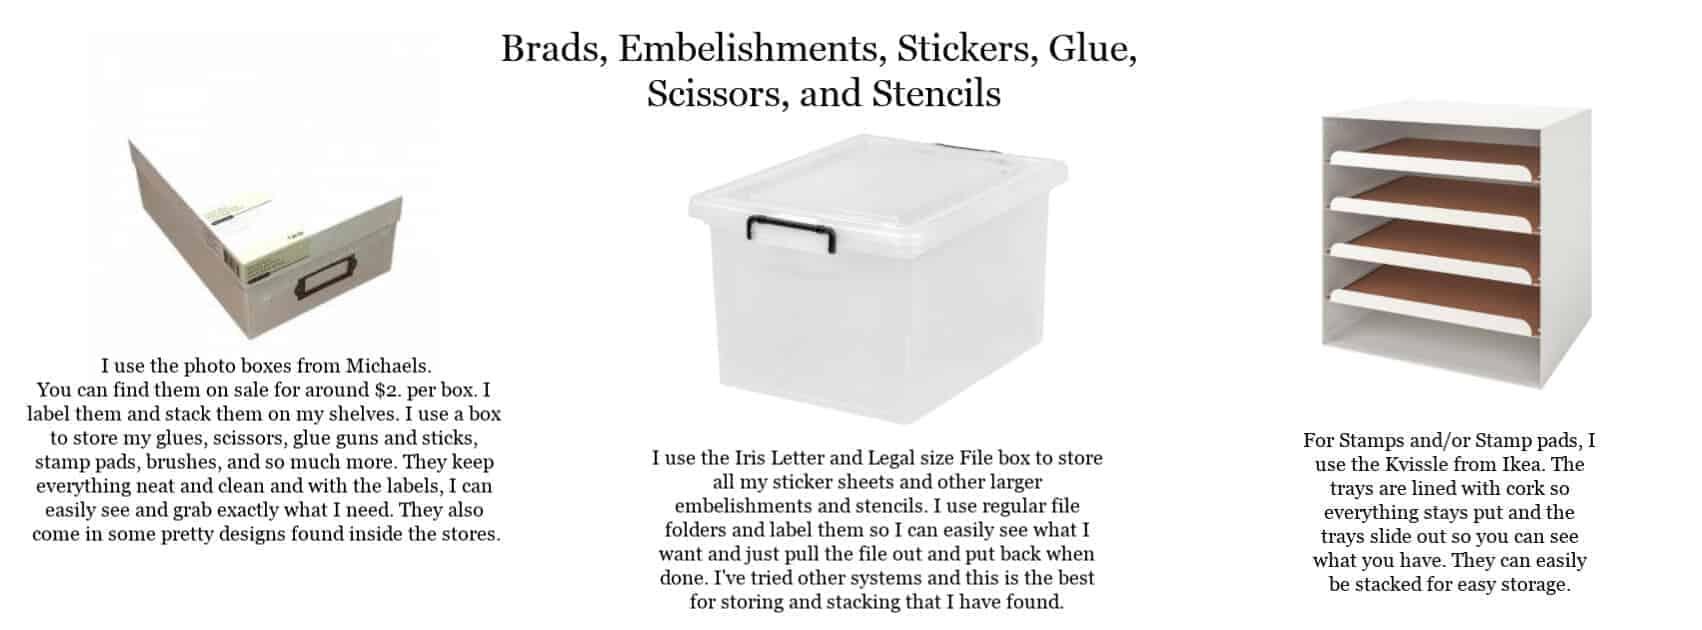 Brads, Embelishments, Stickers, Glue, Scissors, Stamp Pads, Stamps and Stencils Organization